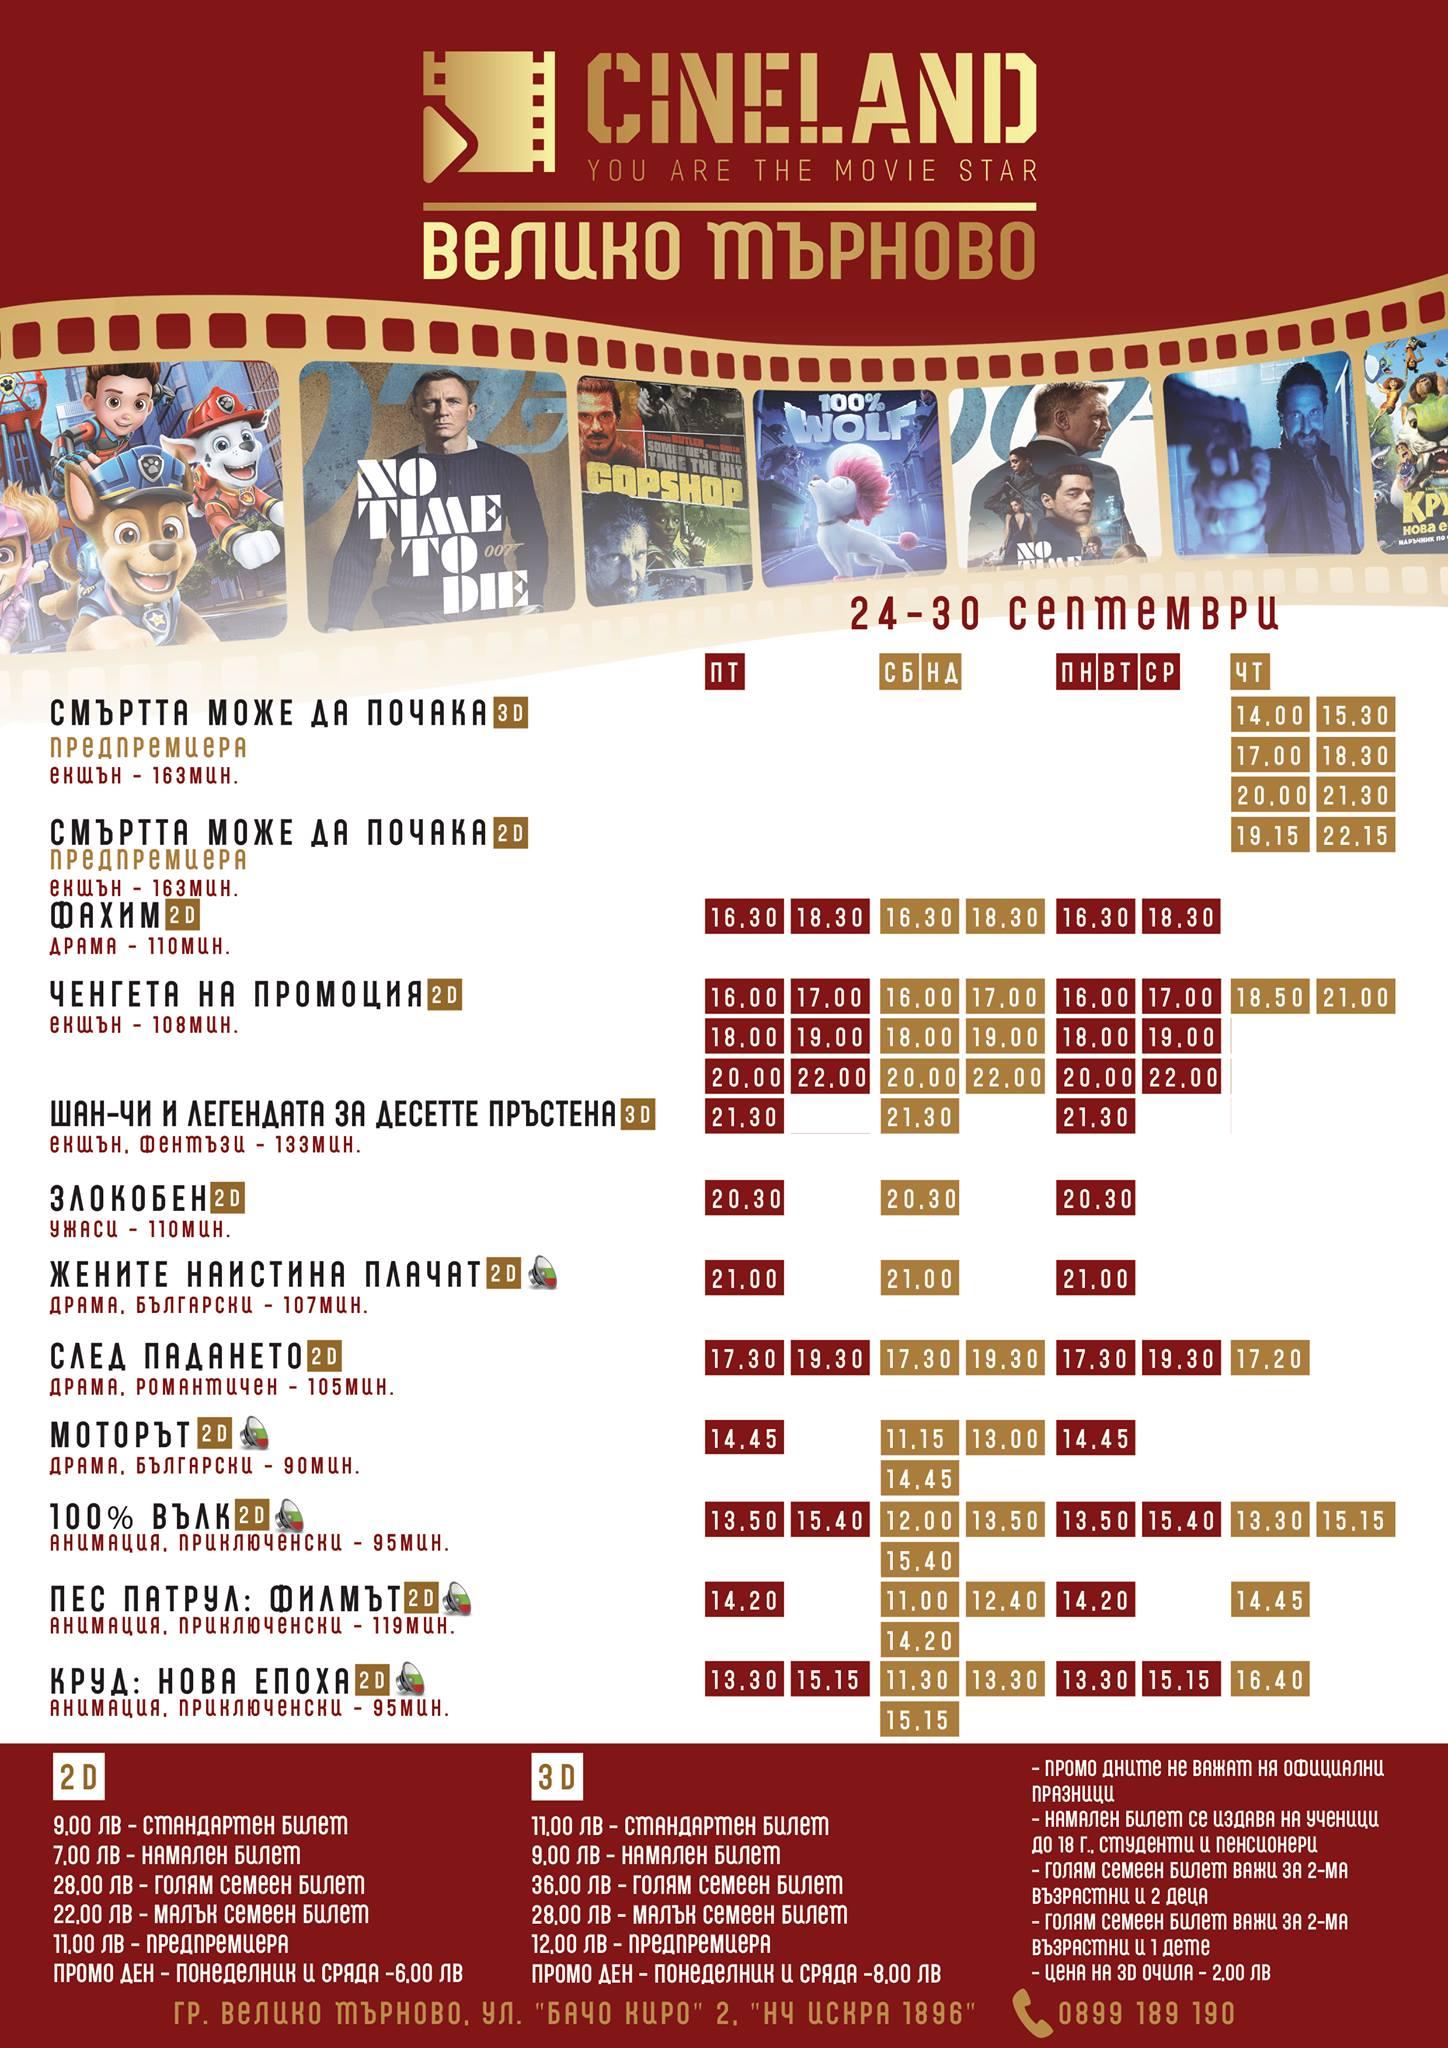 CineLand Iskra Велико Търново: Кино програма - 24-30 септември 2021